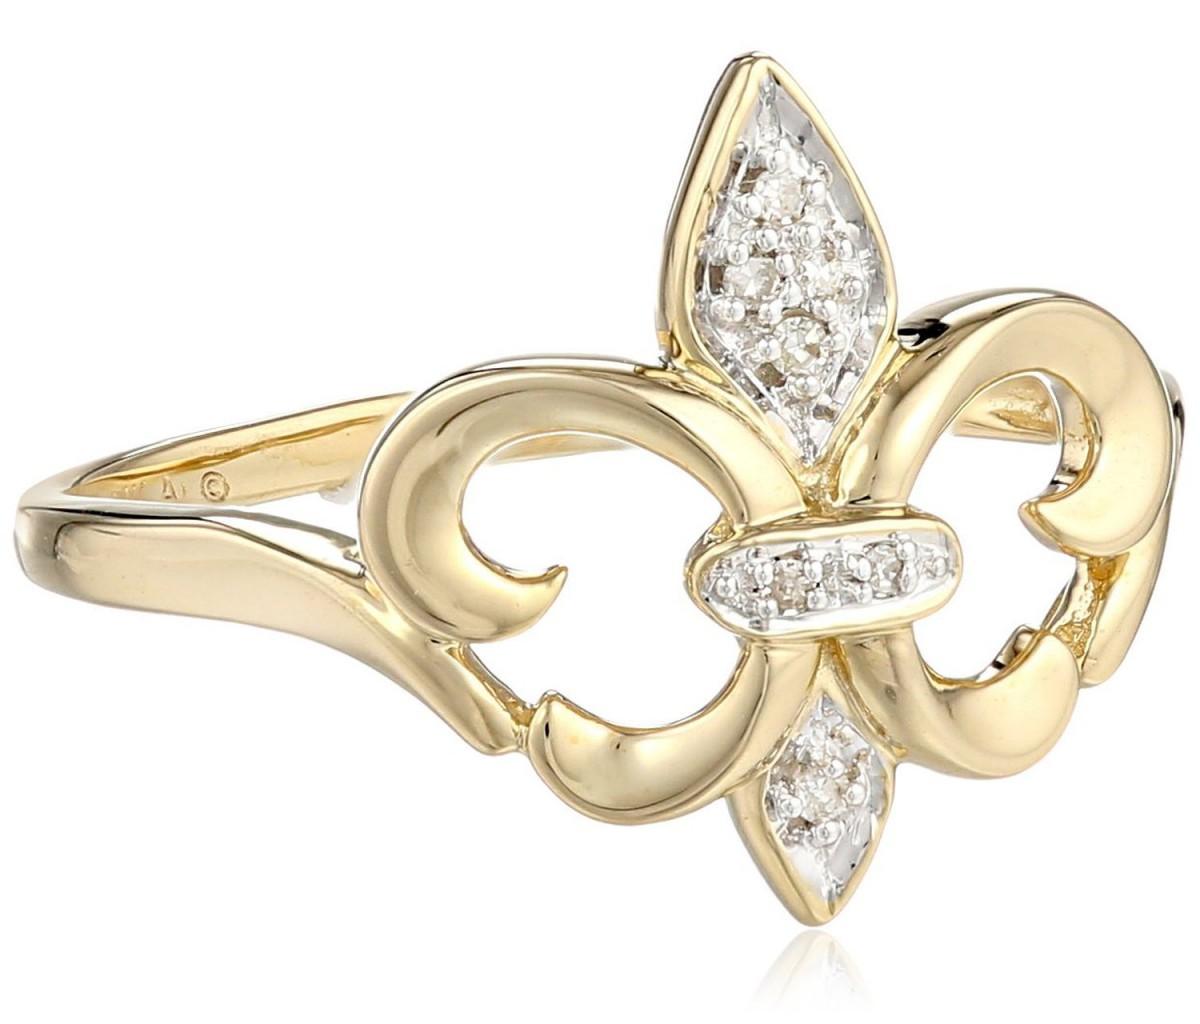 Xpy 14k Yellow Gold Fleur De Lis Diamond Ring Visuall Co